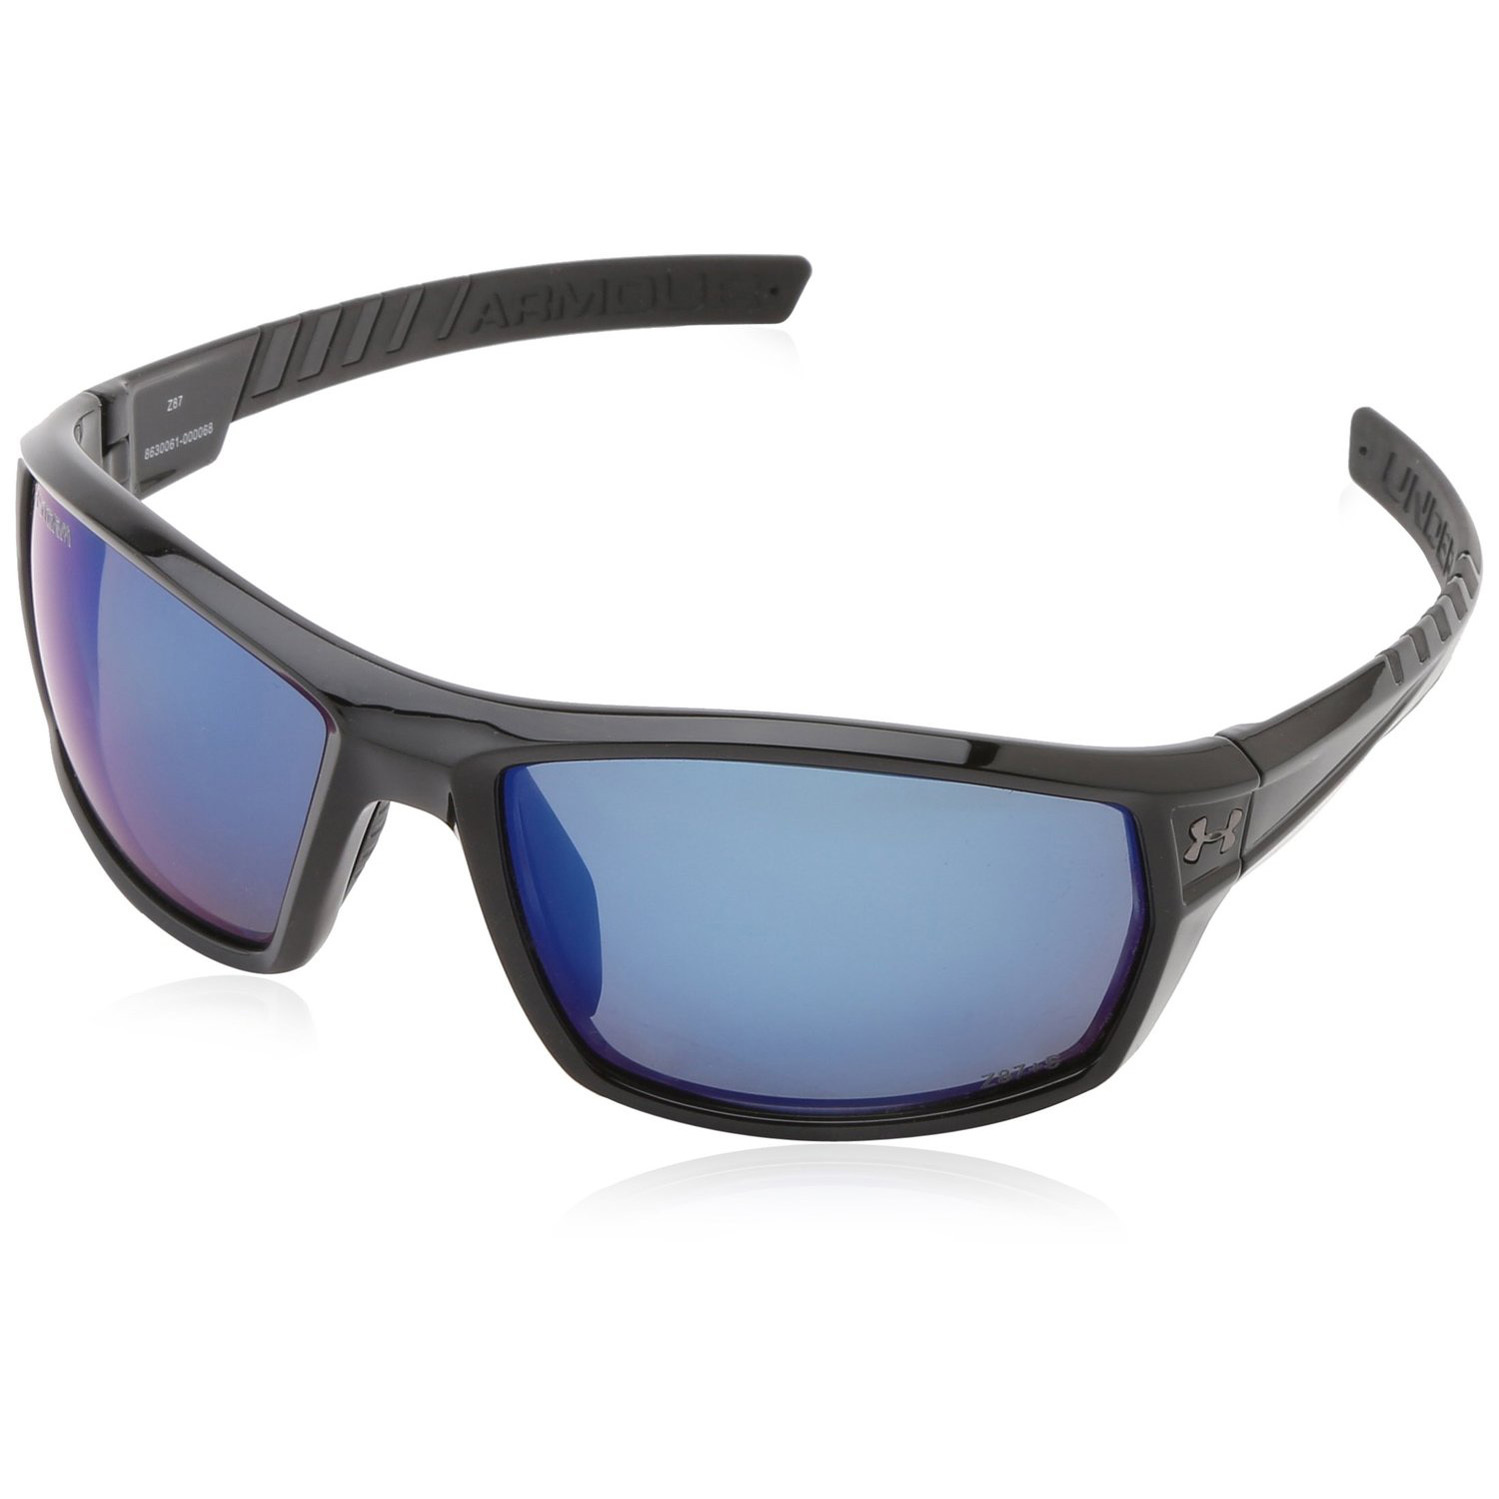 ecb71d0413 Under Armour Ranger Polarized Sunglasses - Bitterroot Public Library